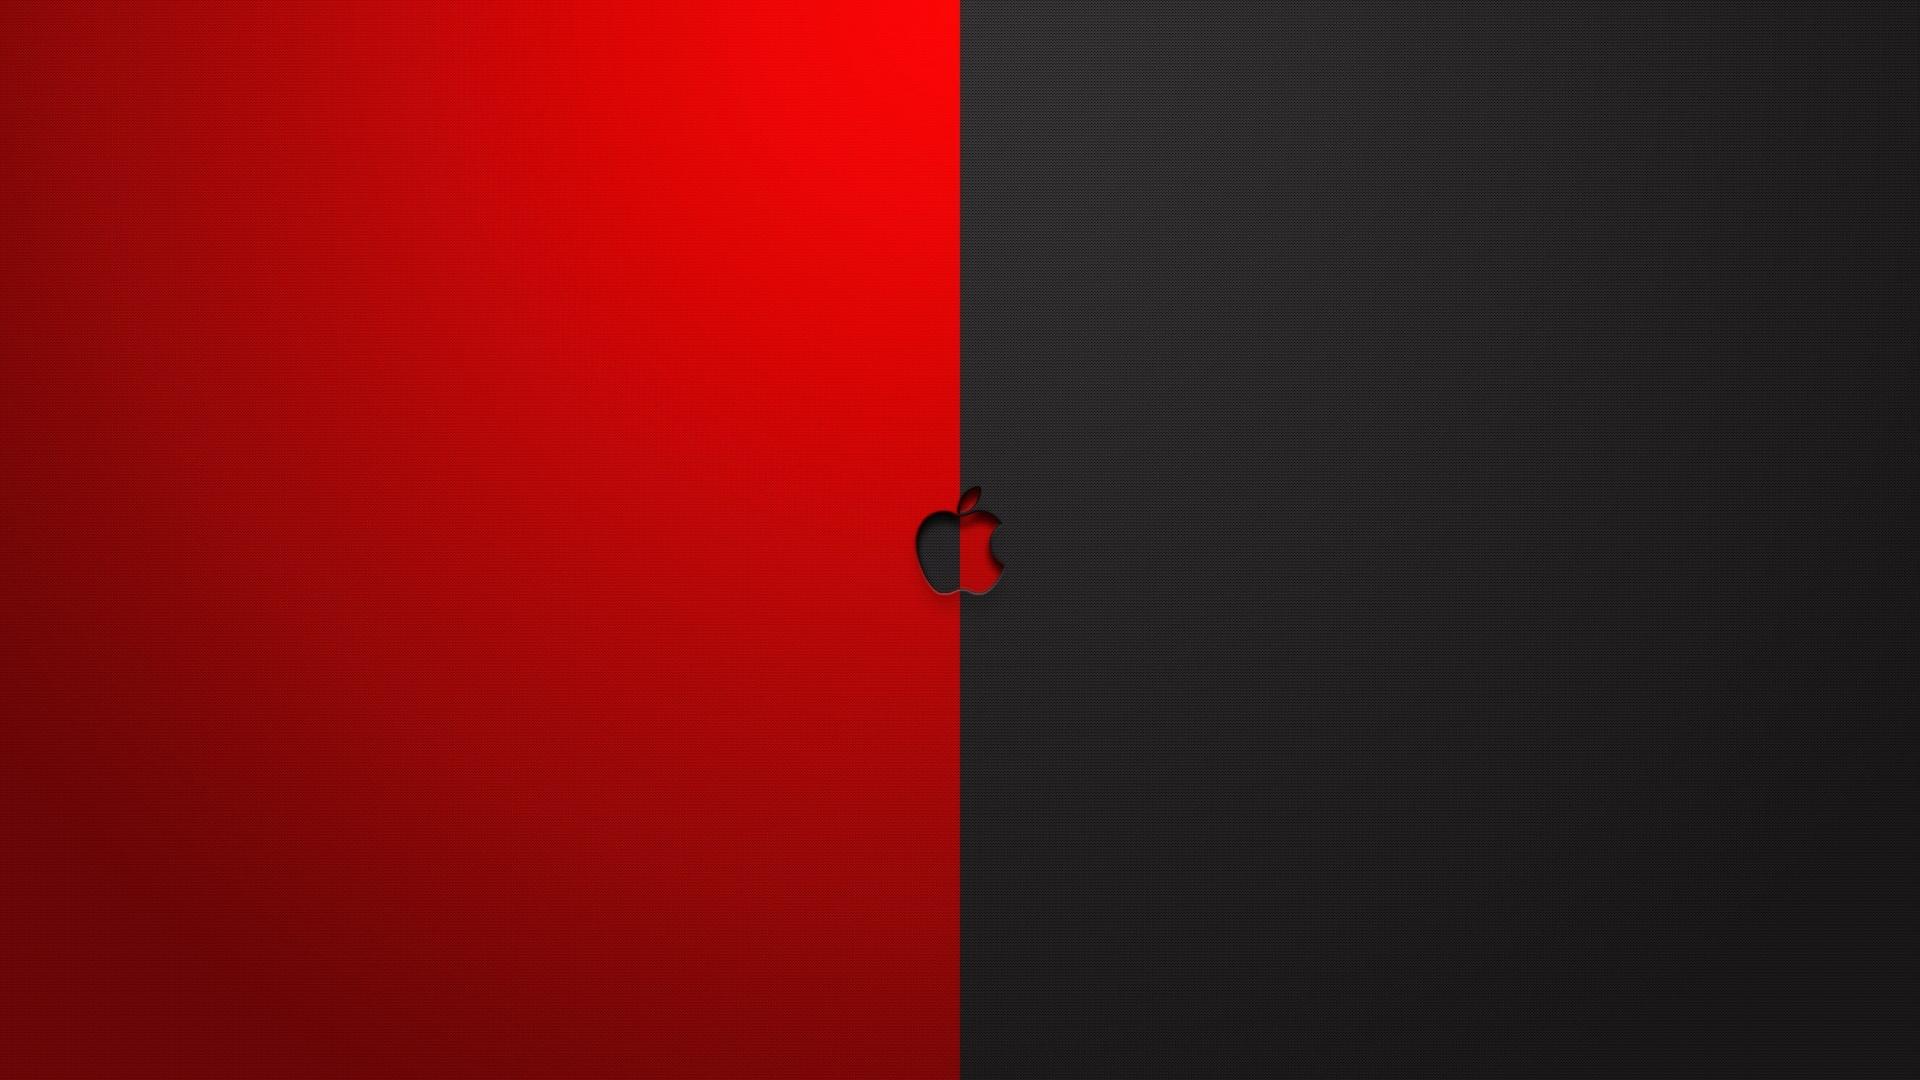 Black Red Wallpaper 1920x1080 Black Red Apples 1920x1080